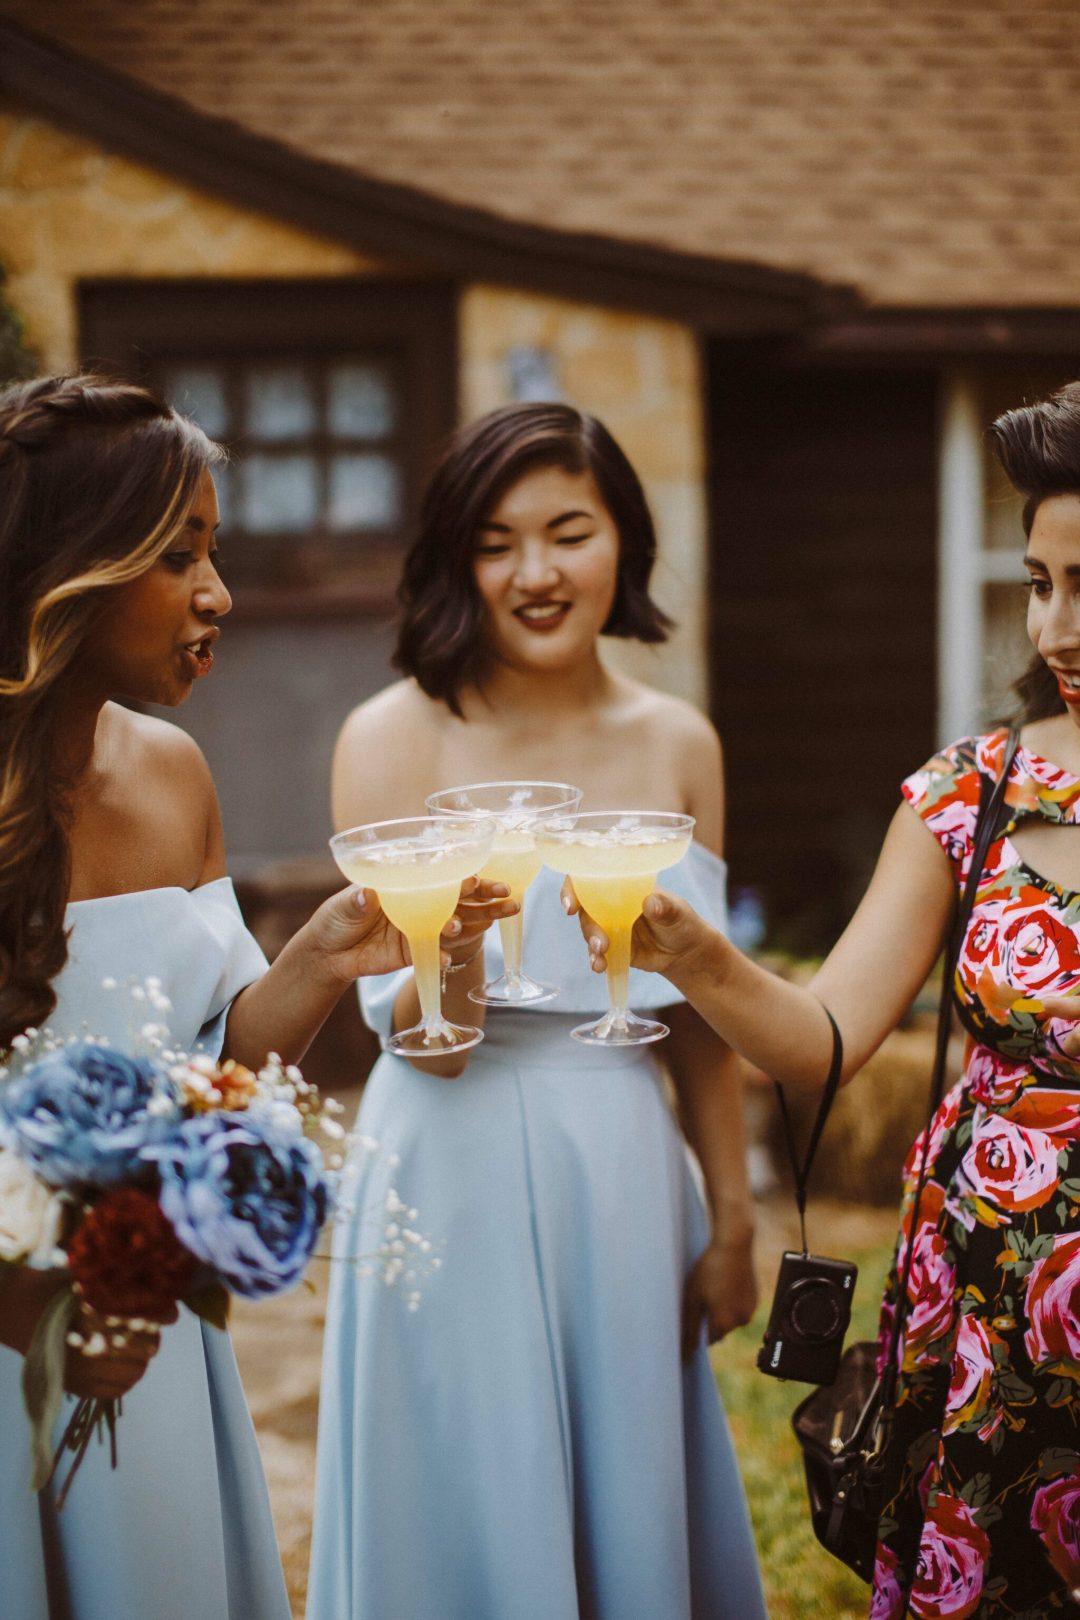 wedding cocktails bridesmaid dress blue